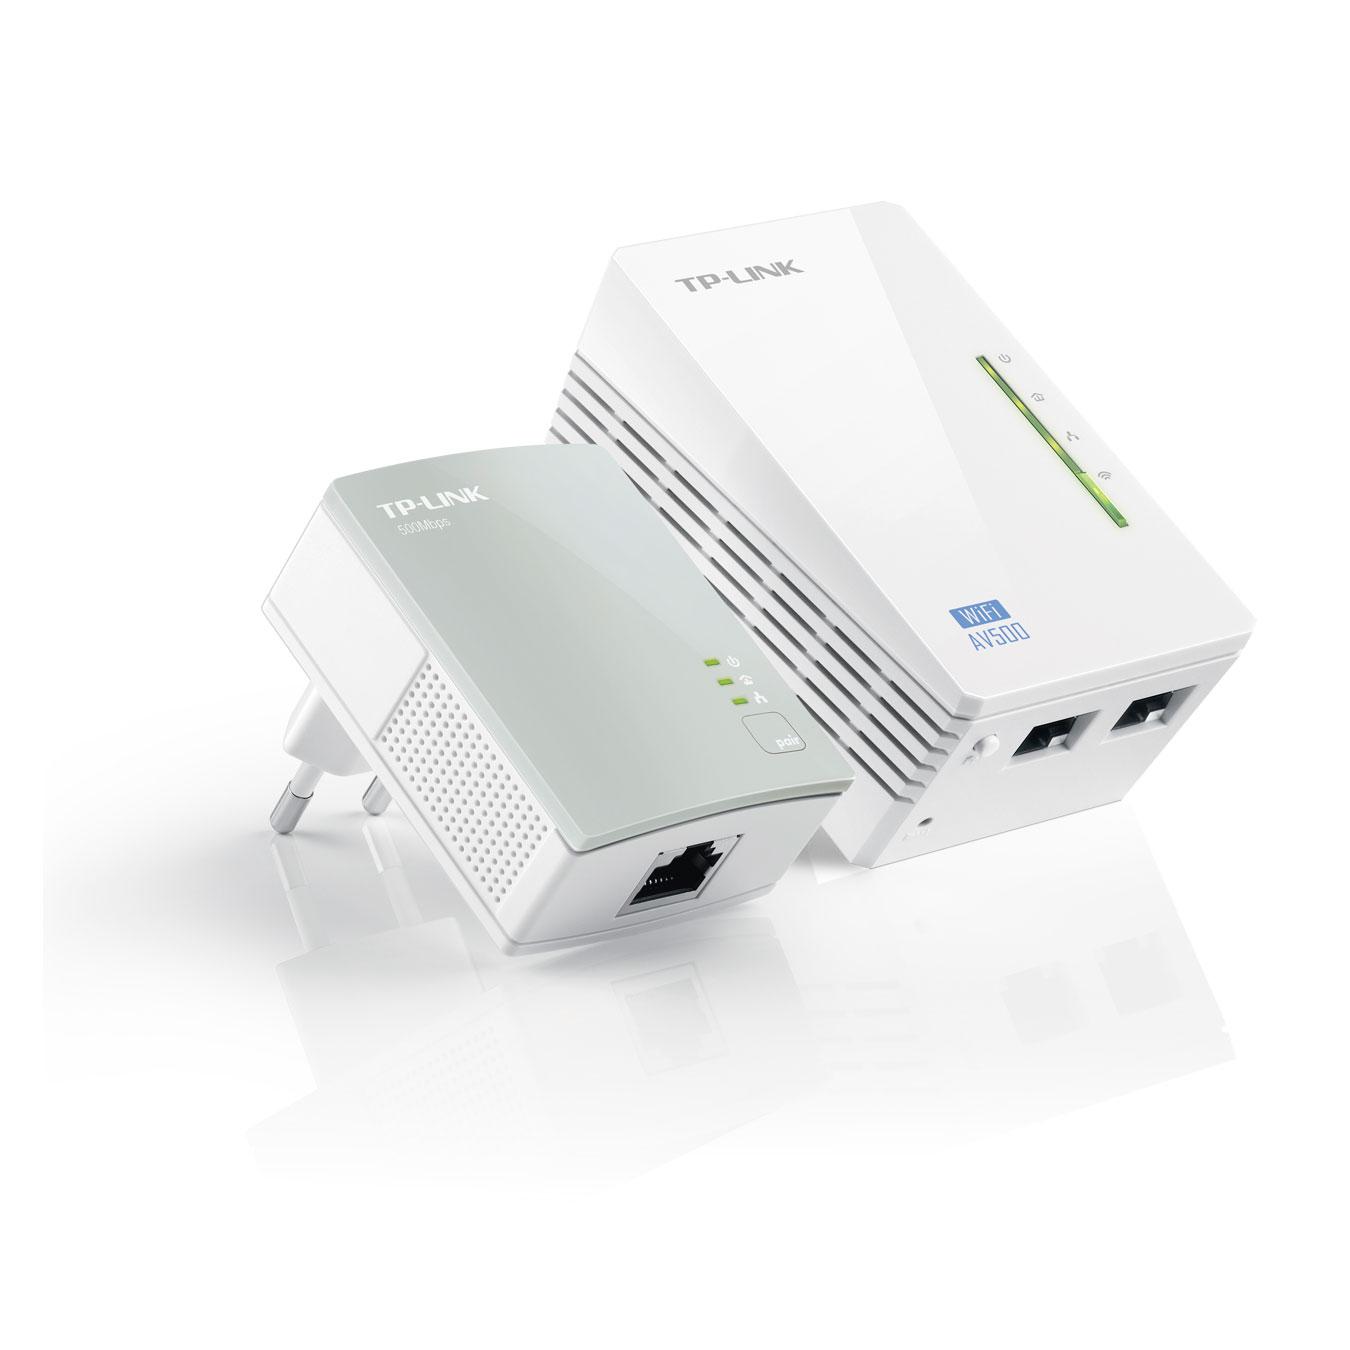 CPL TP-LINK TL-WPA4220KIT Adaptateur CPL 500 Mbps + adaptateur CPL Wi-Fi N 300 Mbps 2 ports